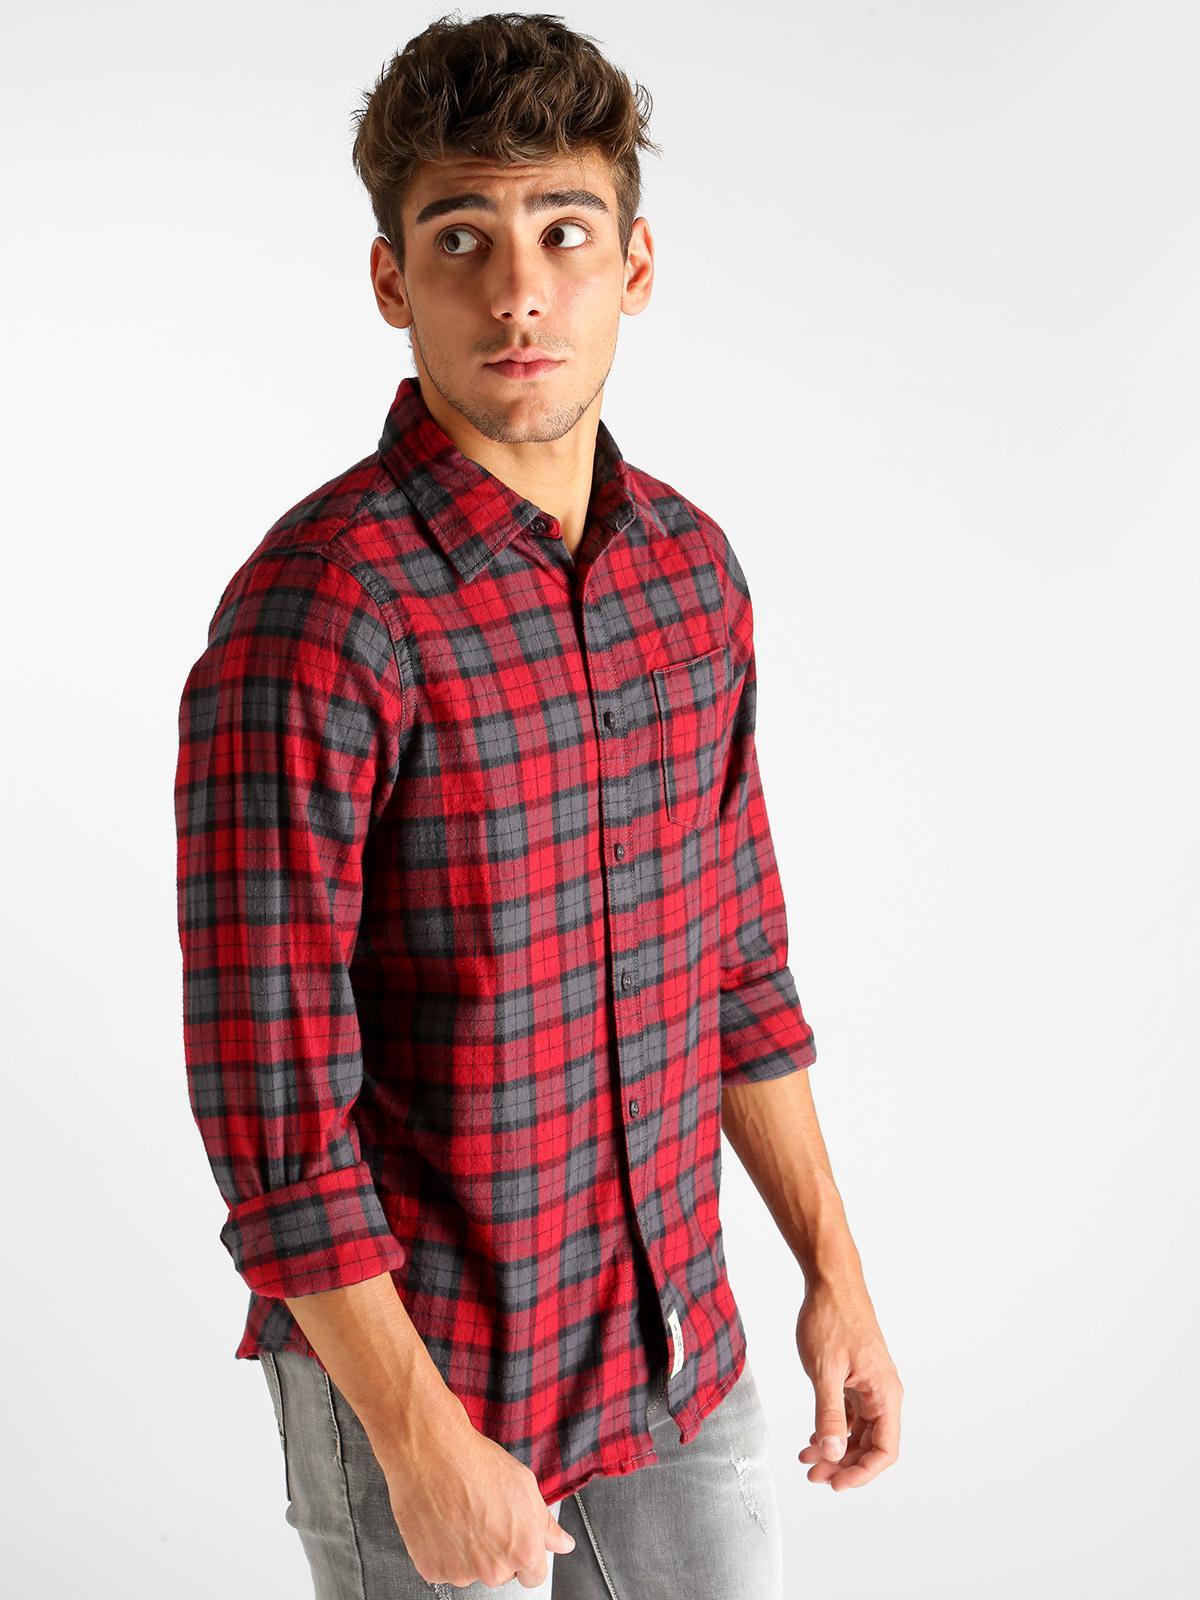 finest selection db17a 1621b Camicia scozzese caldo cotone- slim fit x-cape | MecShopping